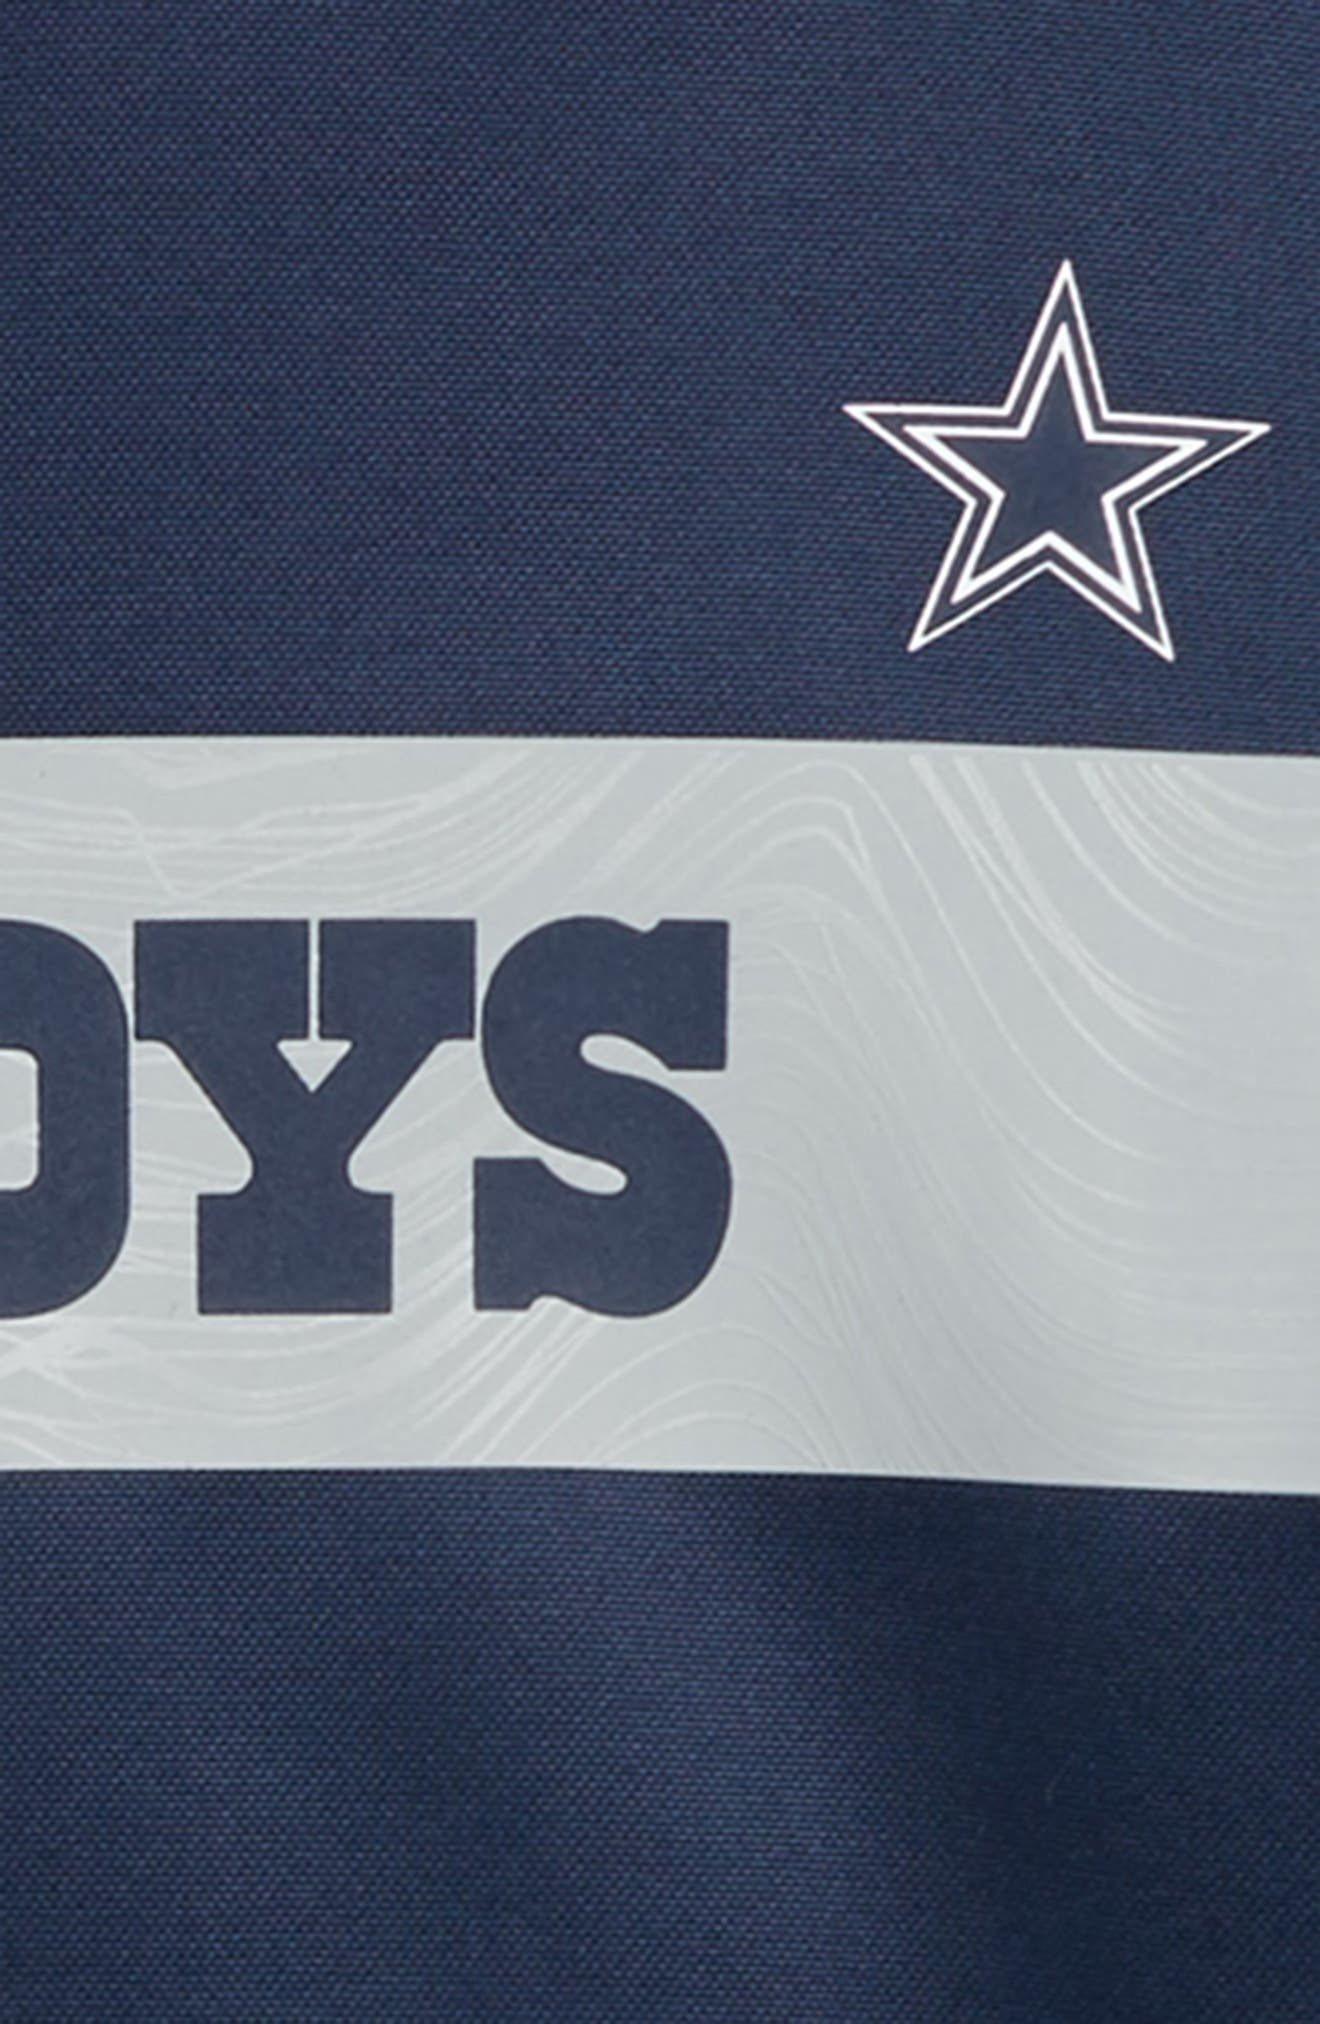 DALLAS COWBOYS,                             Nike NFL Dallas Cowboys Therma Pullover Hoodie,                             Alternate thumbnail 2, color,                             410